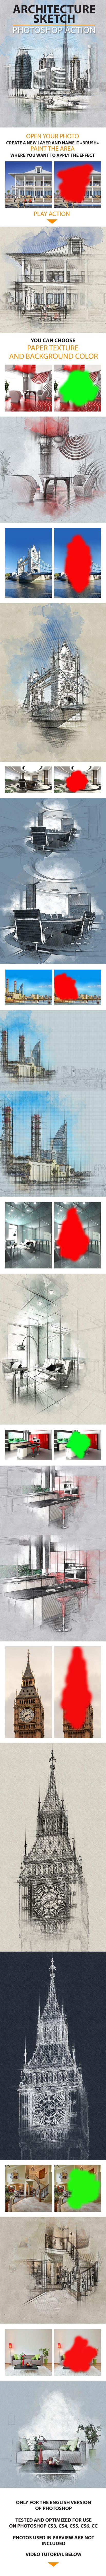 Architecture Sketch Photoshop Action - Actions Photoshop